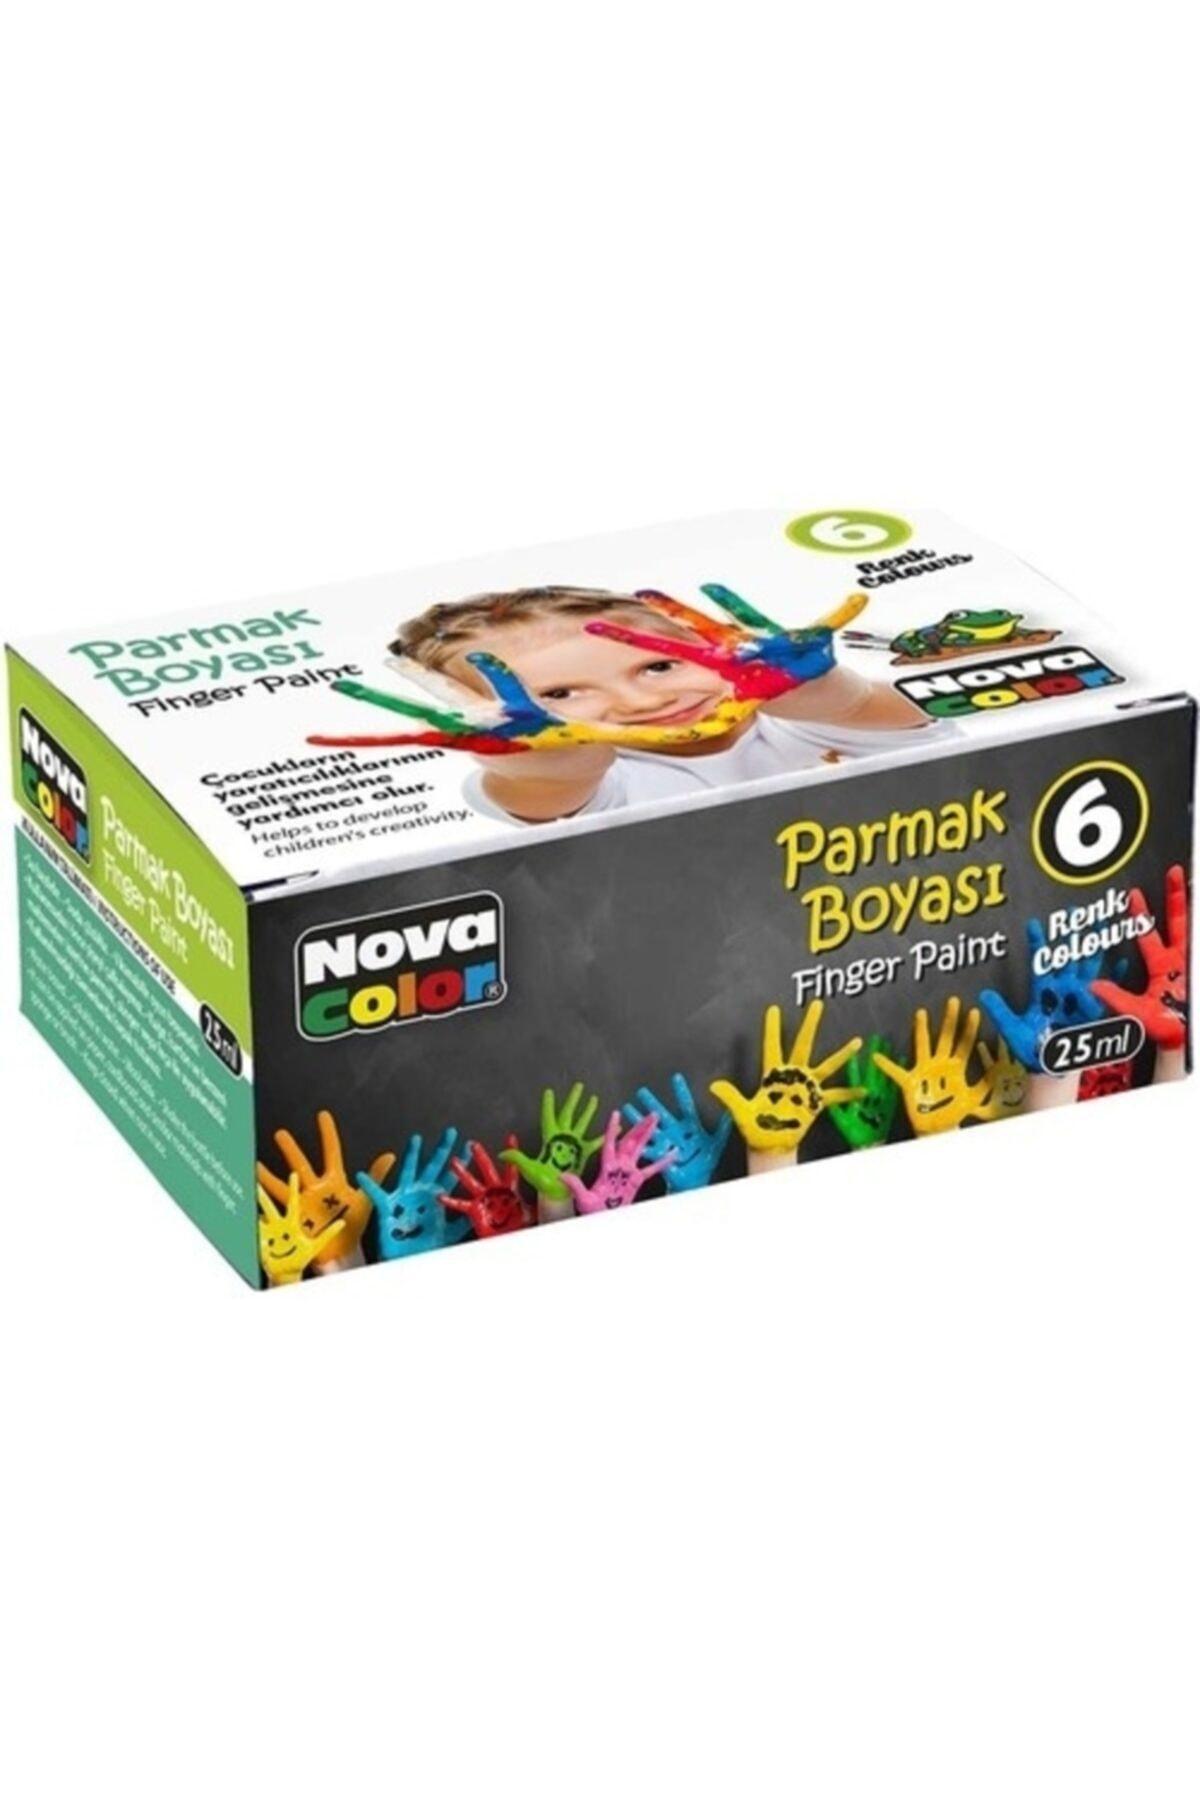 Nova Color Parmak Boyası 6 Renk 25 Ml (nc-138) 1